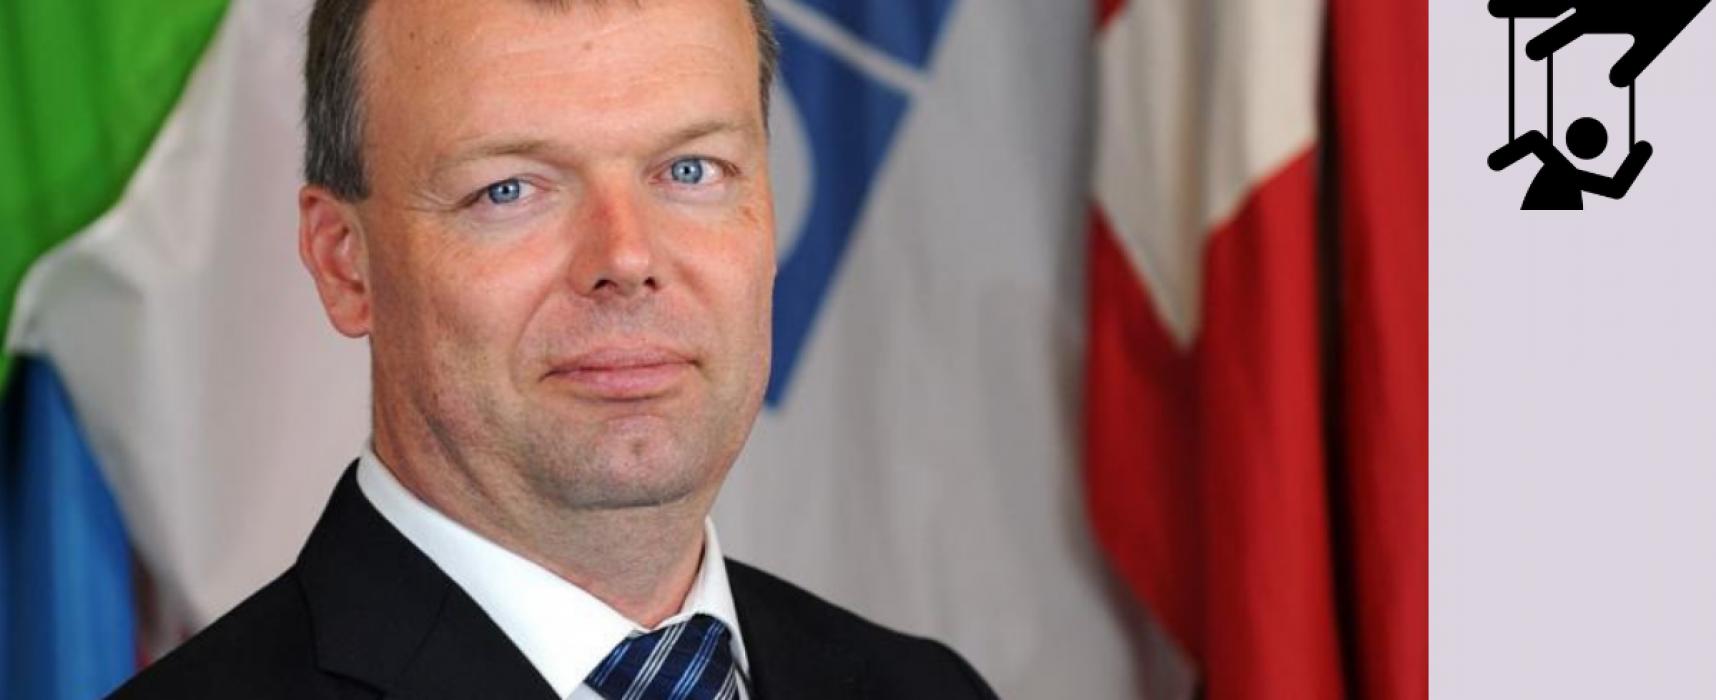 Что на самом деле увидел Александр Хуг из ОБСЕ на Донбассе